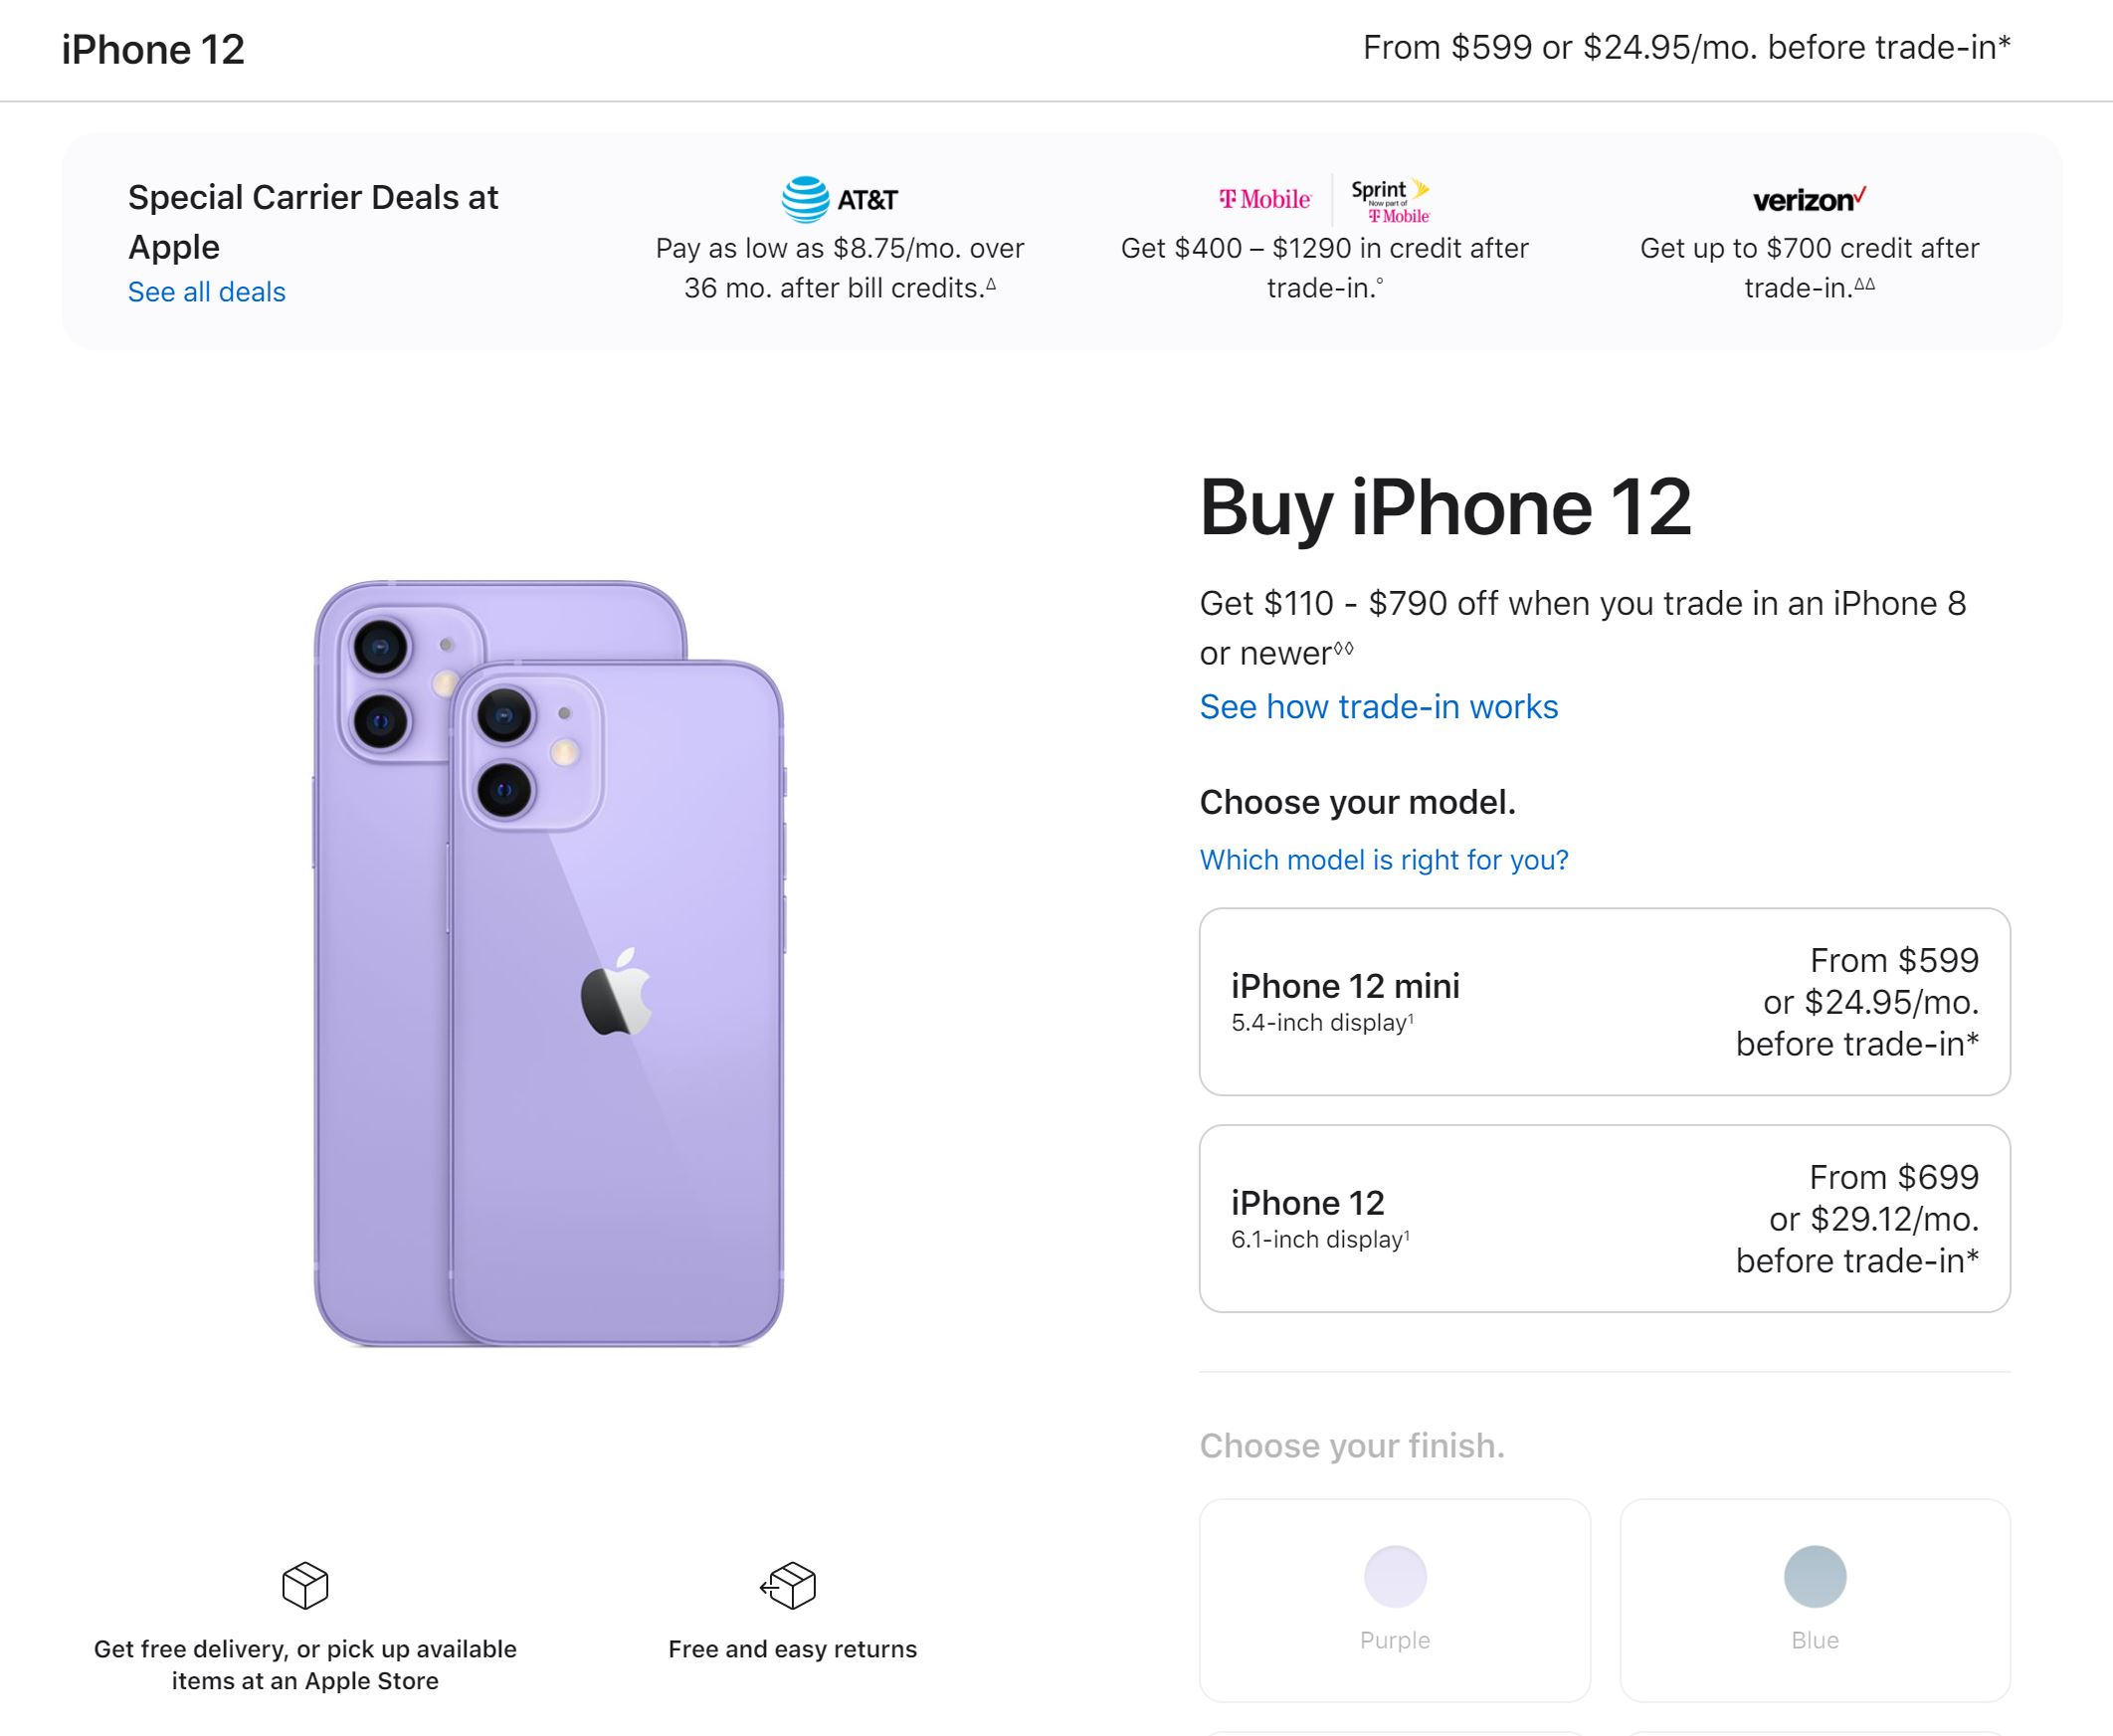 iPhone 12 Apple Store